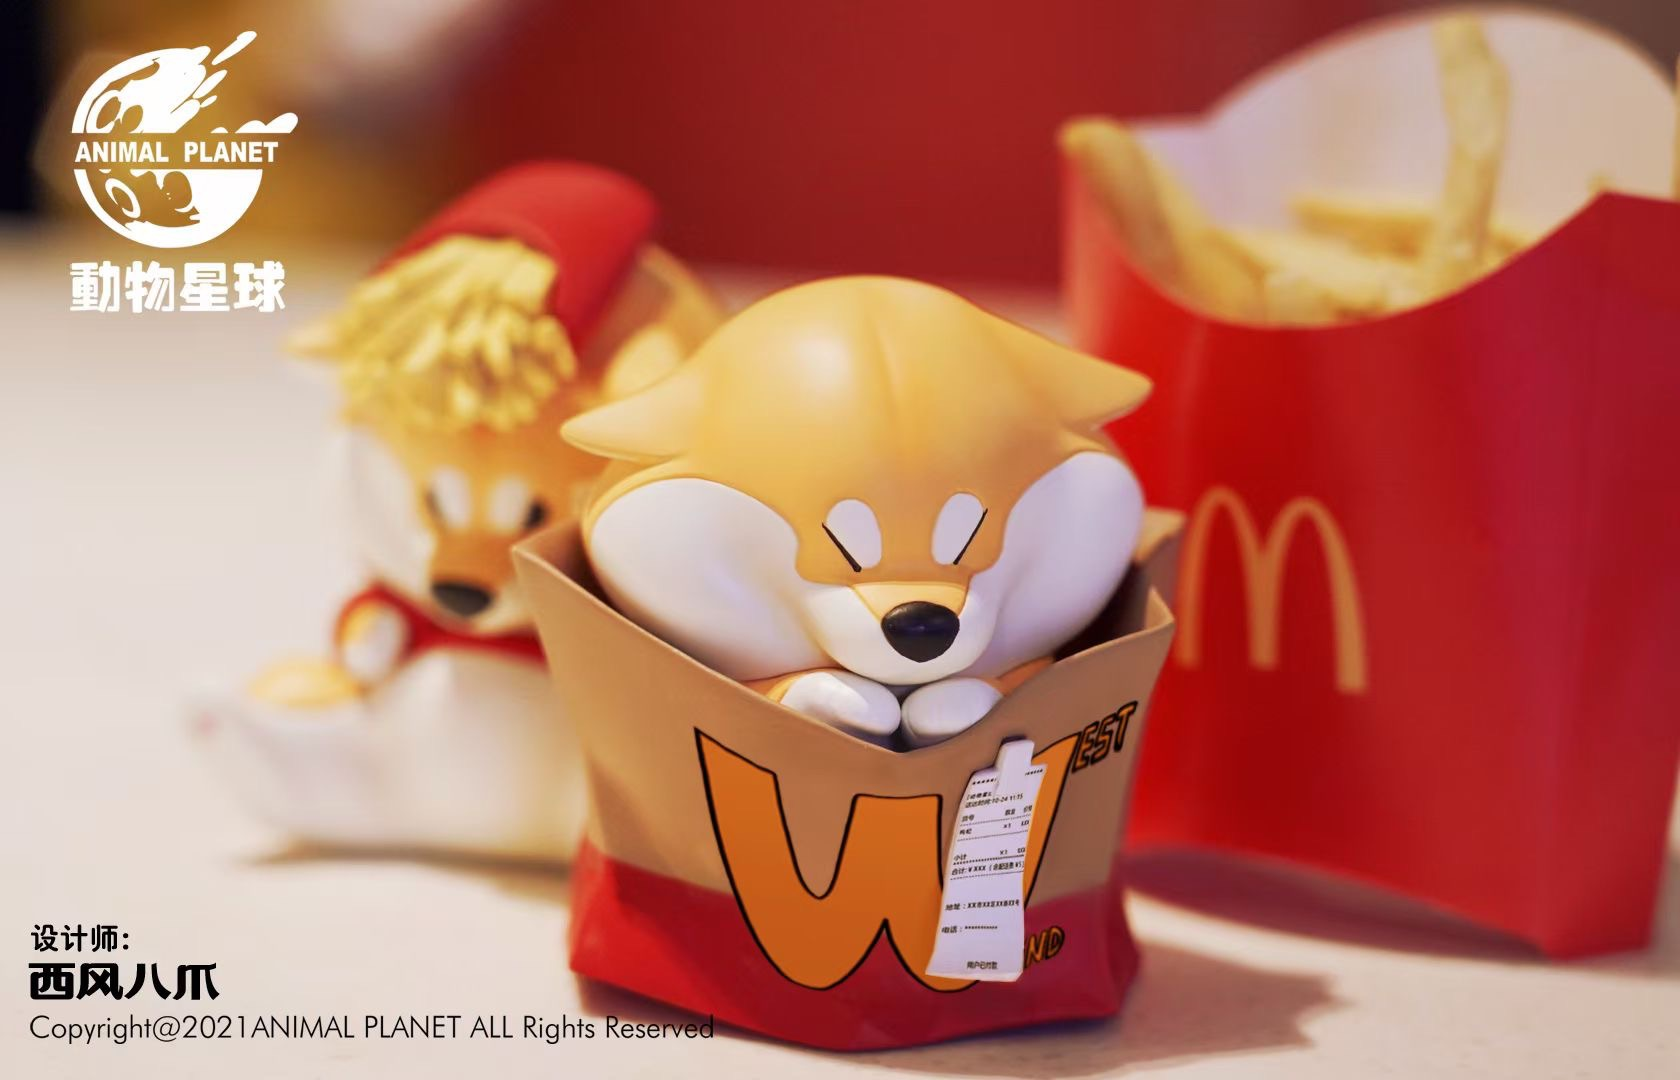 A Shiba x McDonald ชิบะแม็ค Animal Planet (มัดจำ)